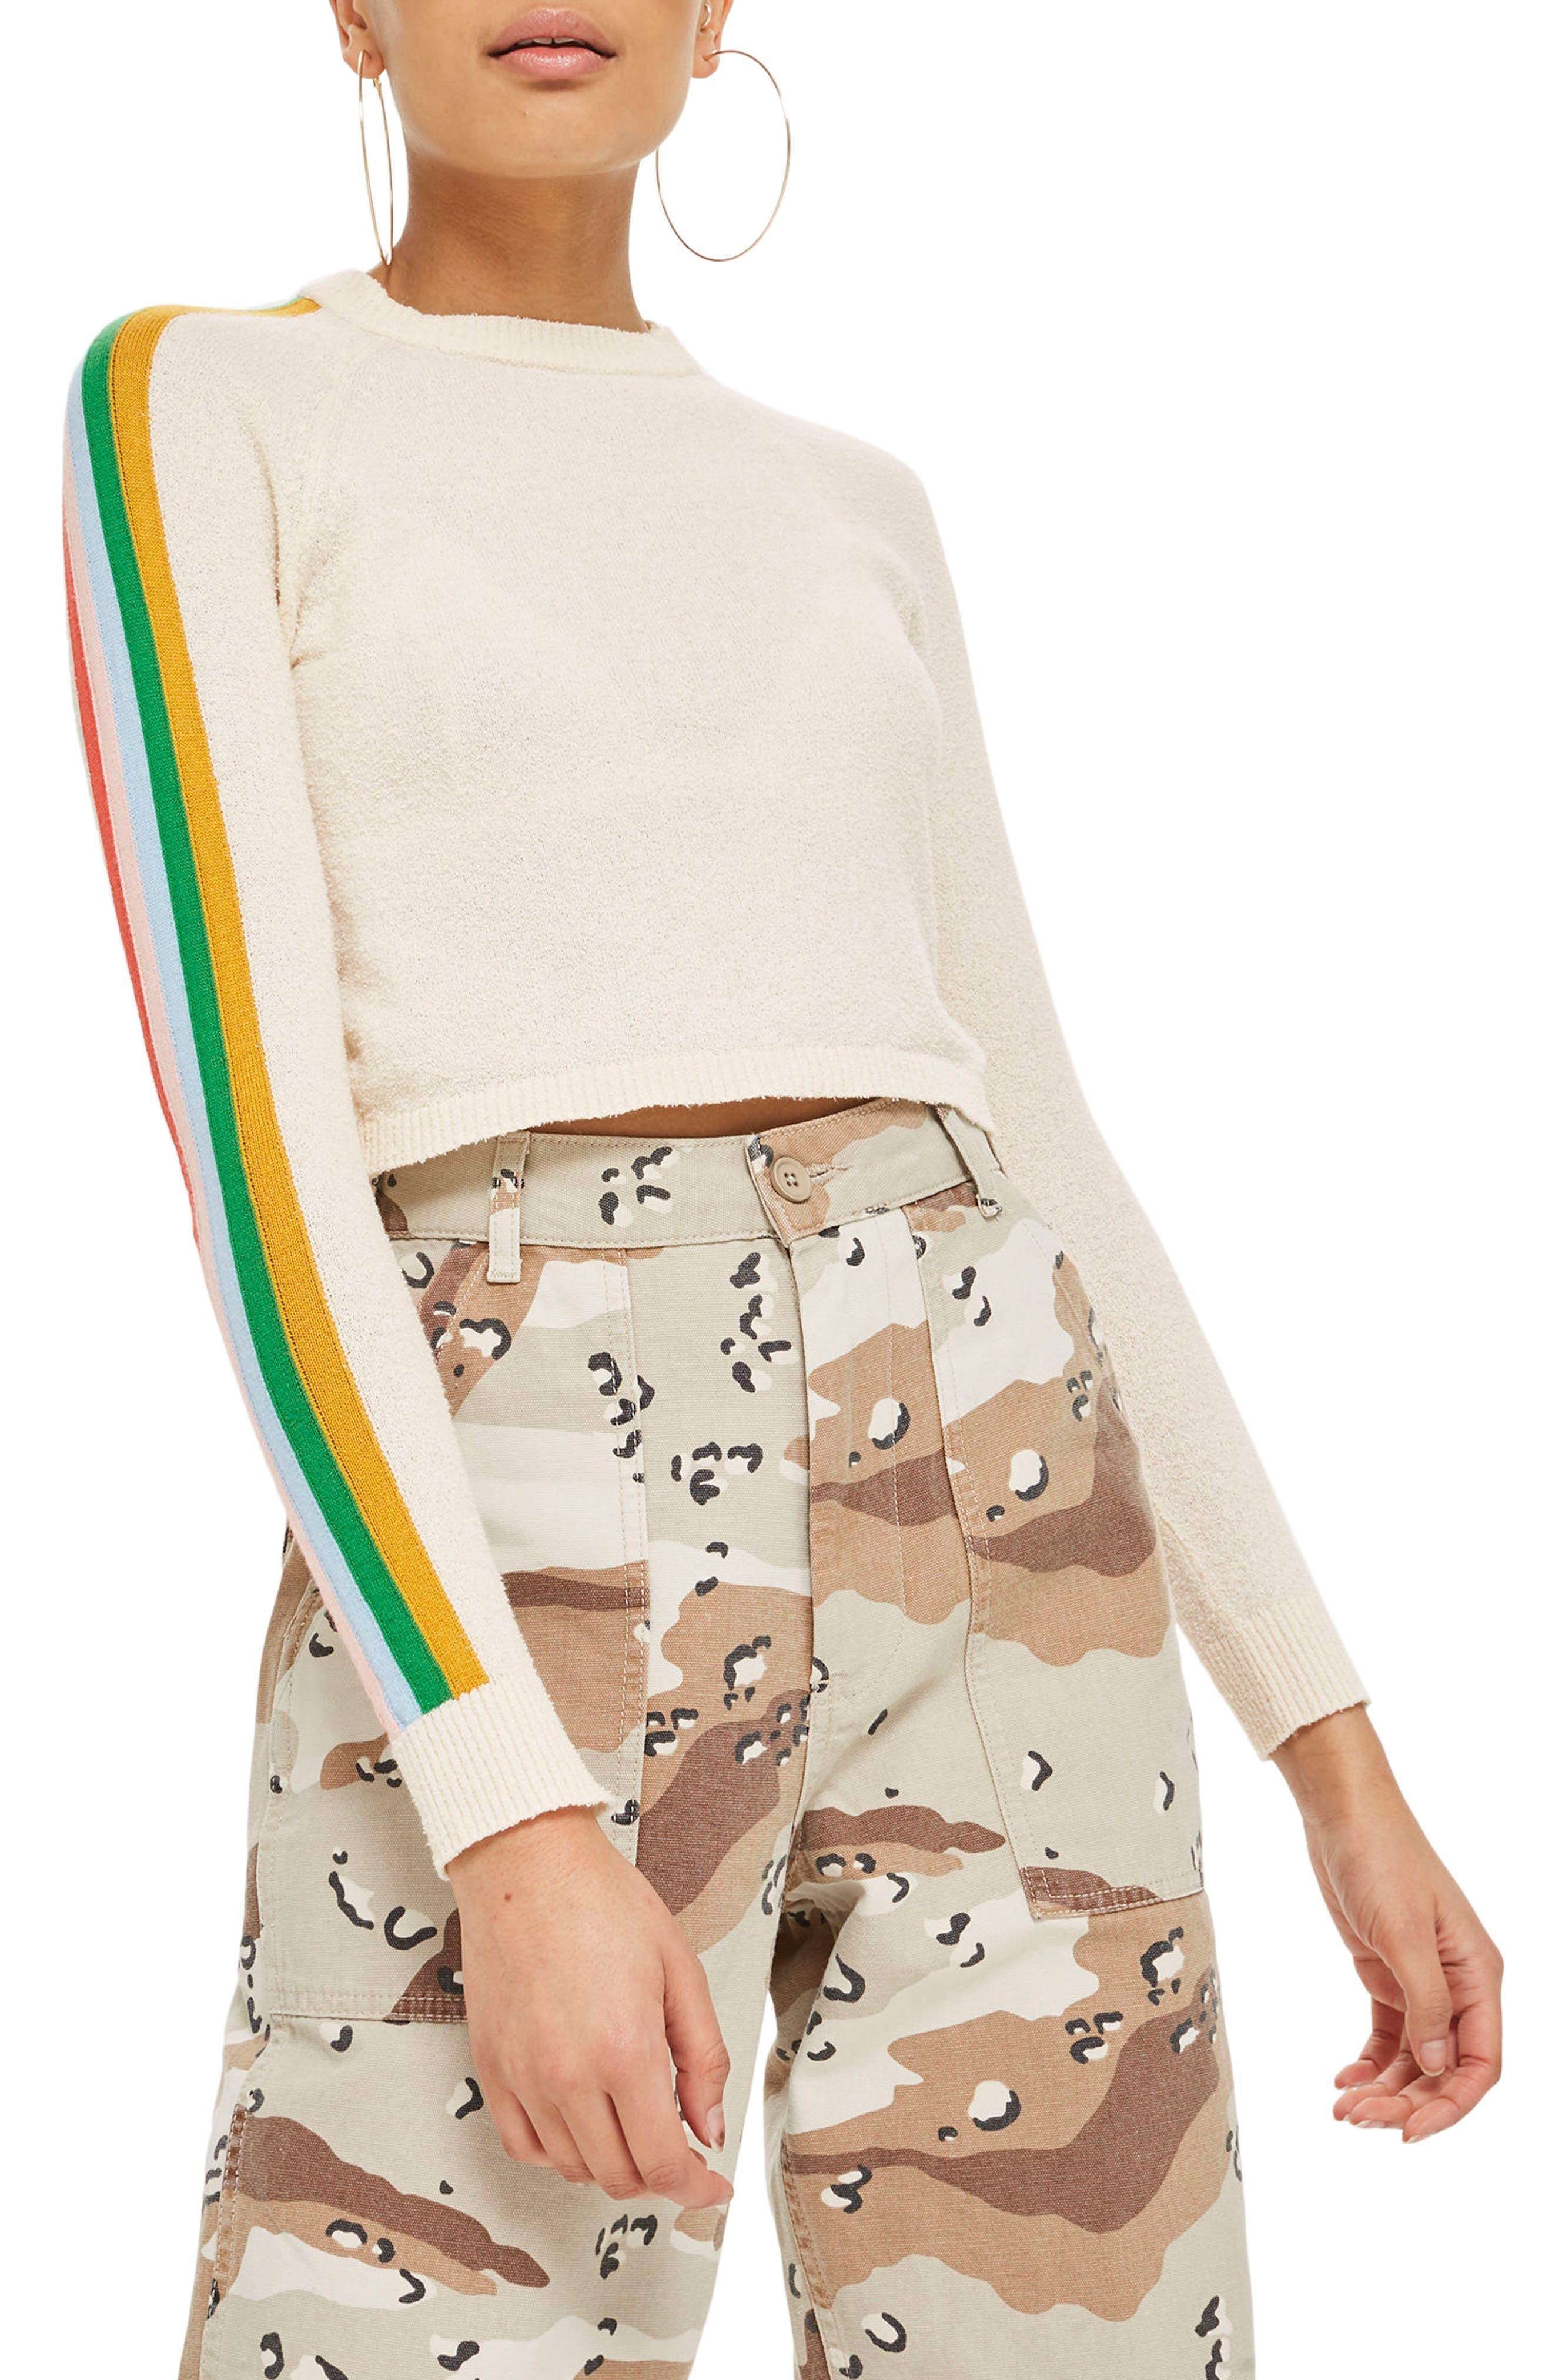 Topshop Rainbow Sleeve Knit Top